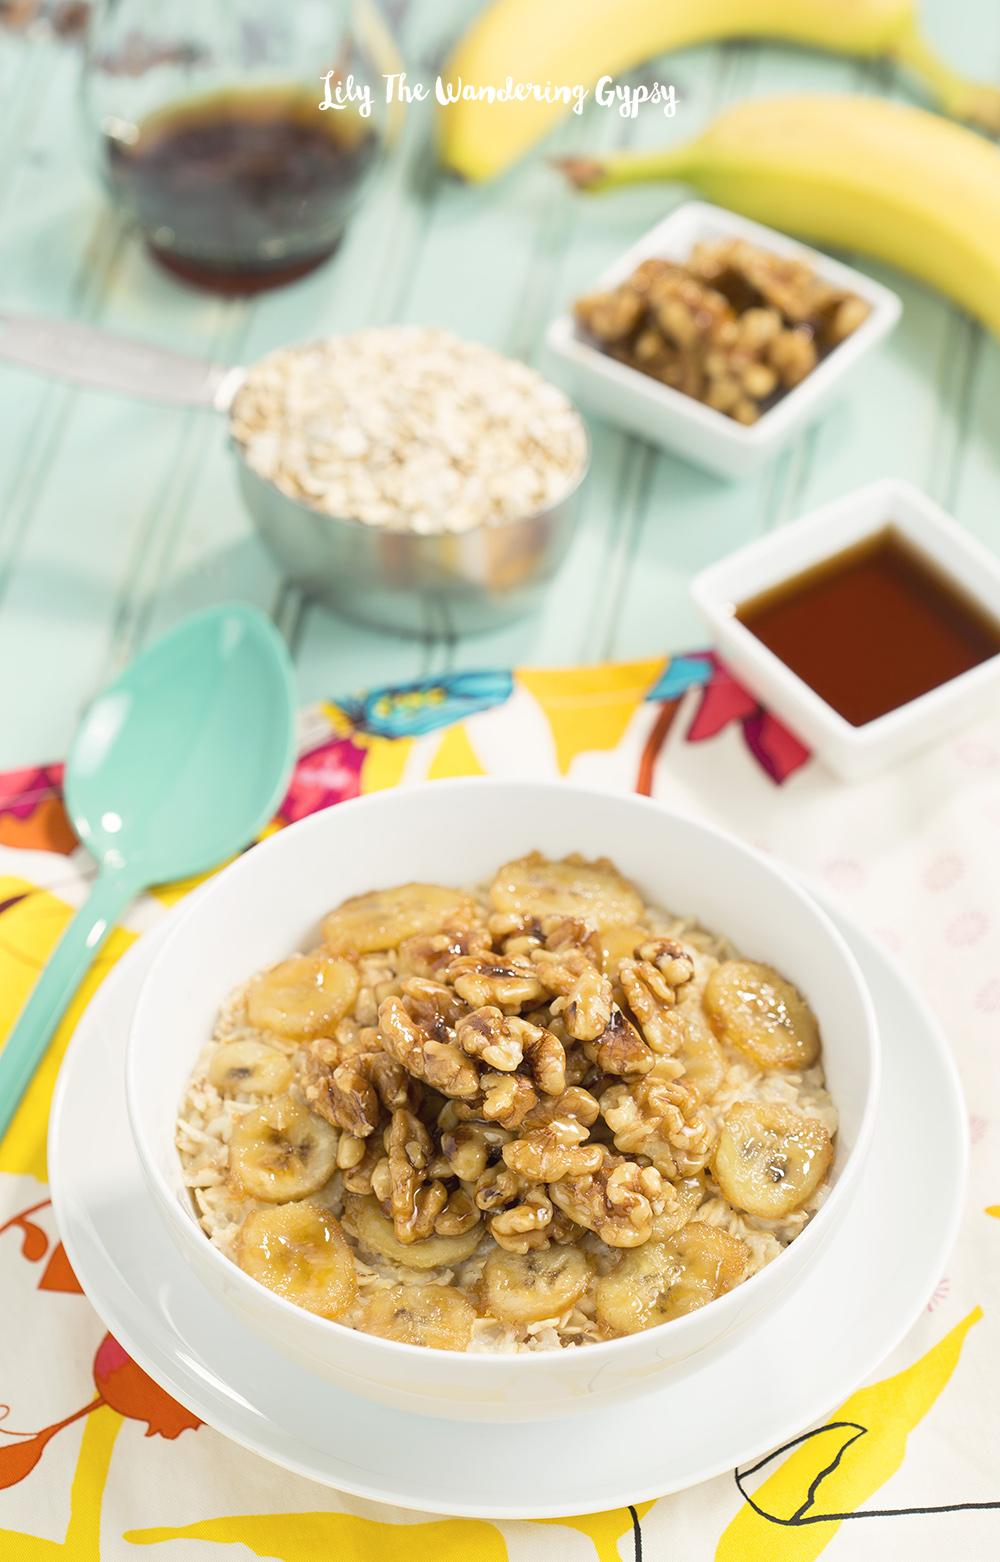 Amazing Oatmeal Recipe!